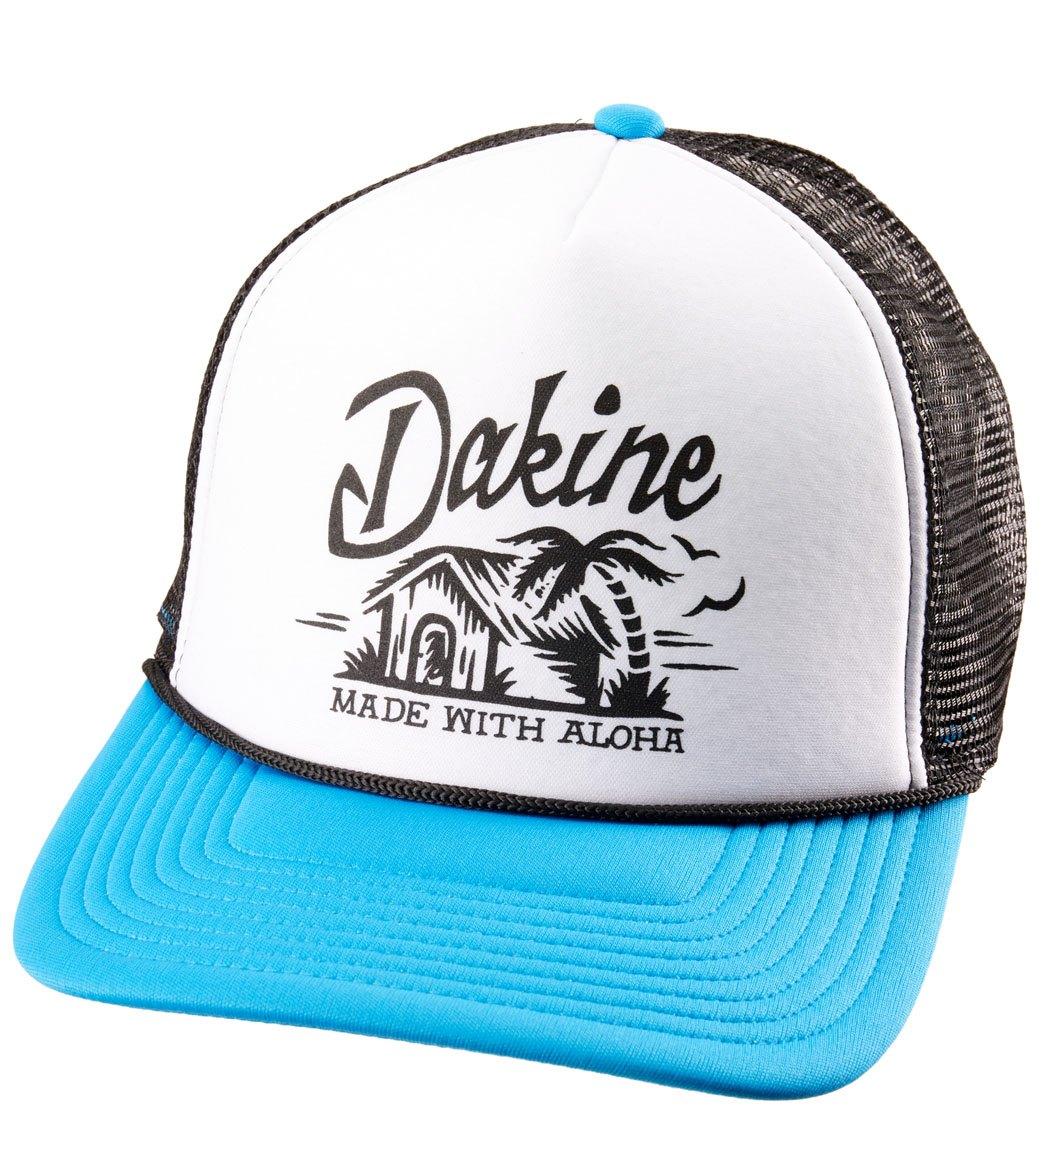 c16fbb08476 Dakine Men s Beach Hut Trucker Hat at SwimOutlet.com